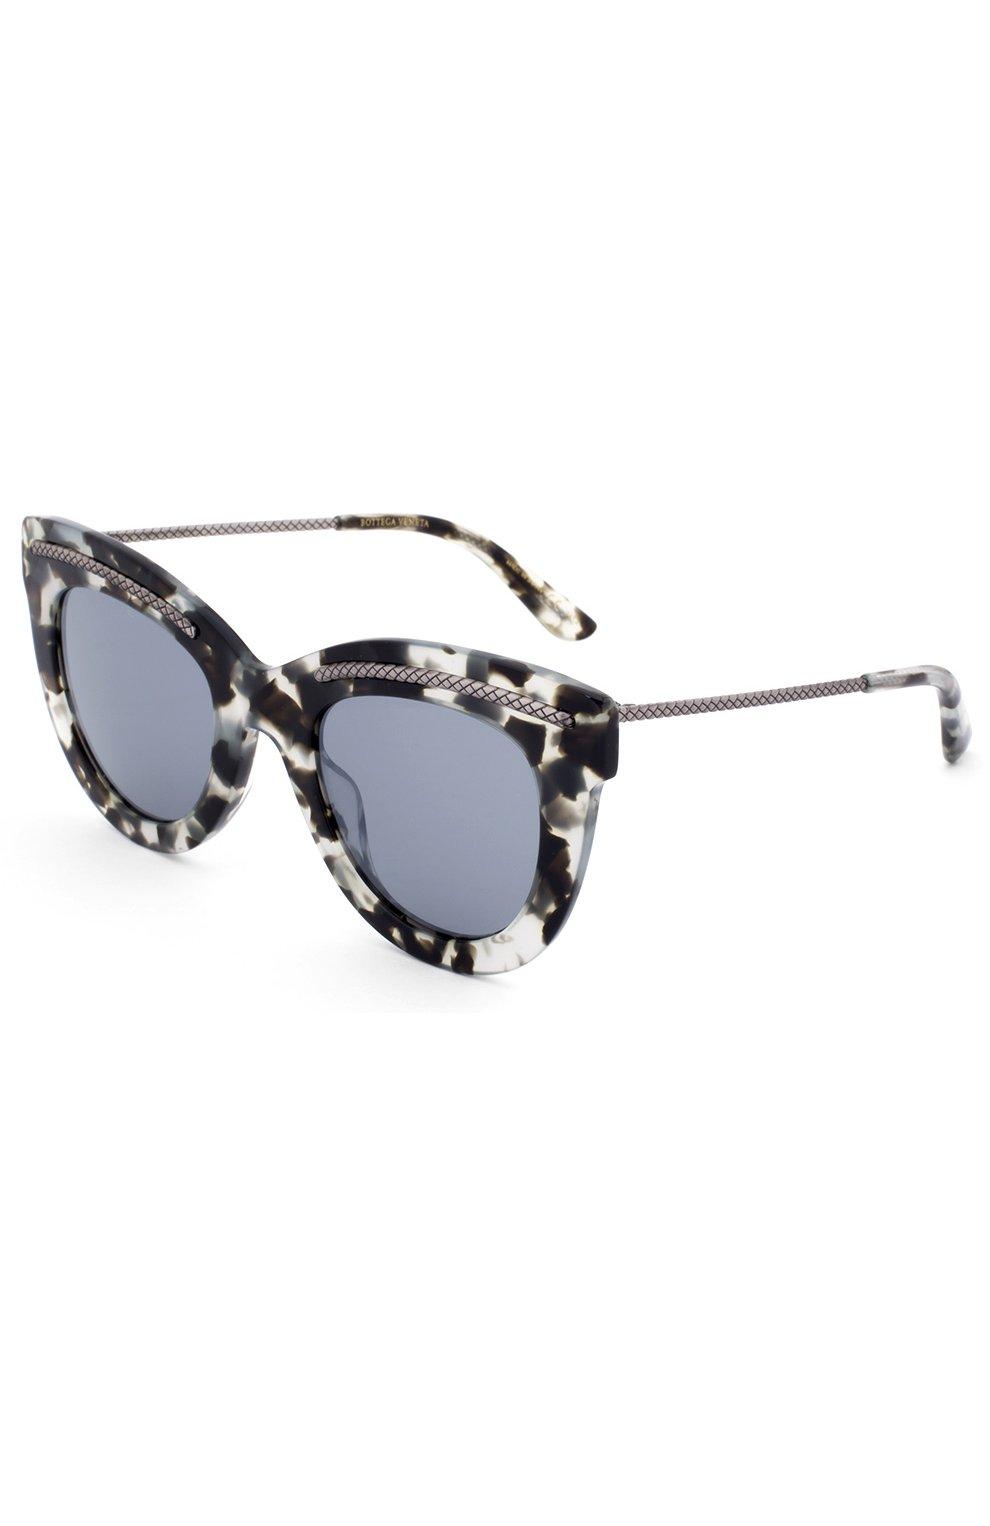 Женские солнцезащитные очки BOTTEGA VENETA хаки цвета, арт. 0030 005 | Фото 1